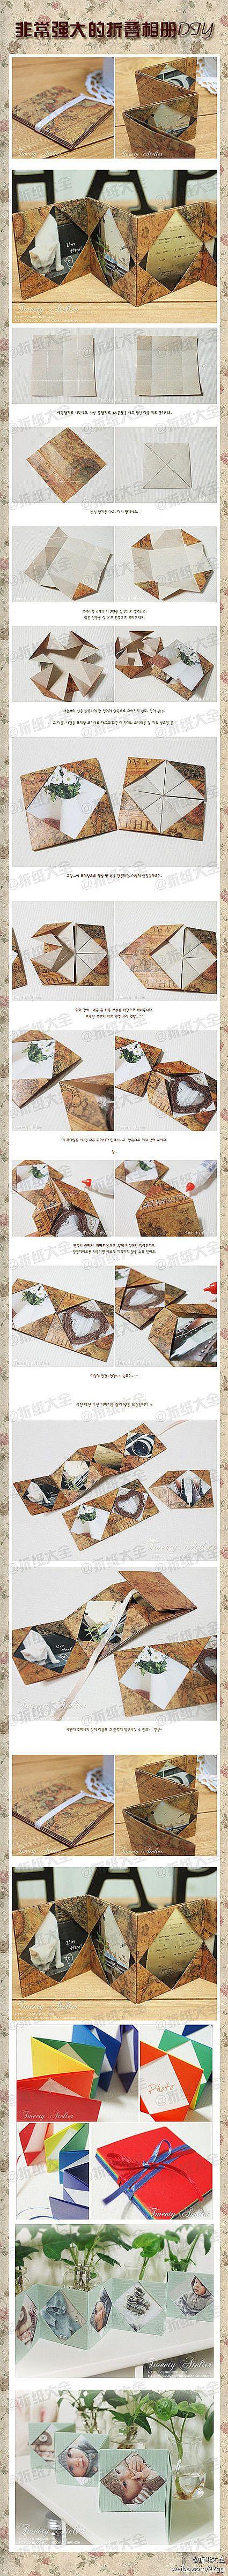 手工DIY *-**-*DIY- 复古感十足的的折叠相册!!!… Too cool. Lovely origami picture frame!